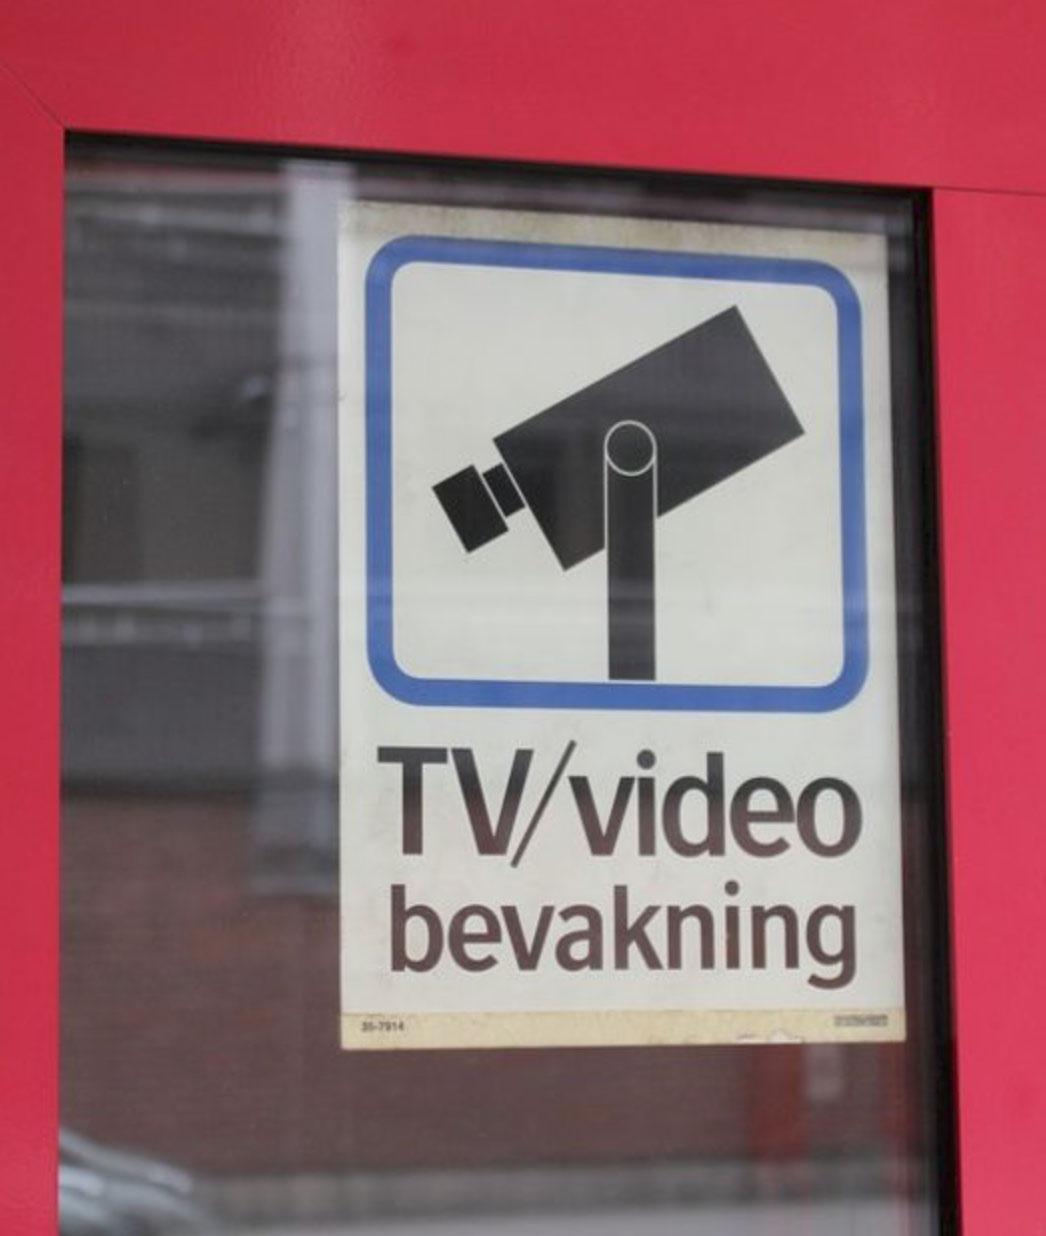 kamerabevakning